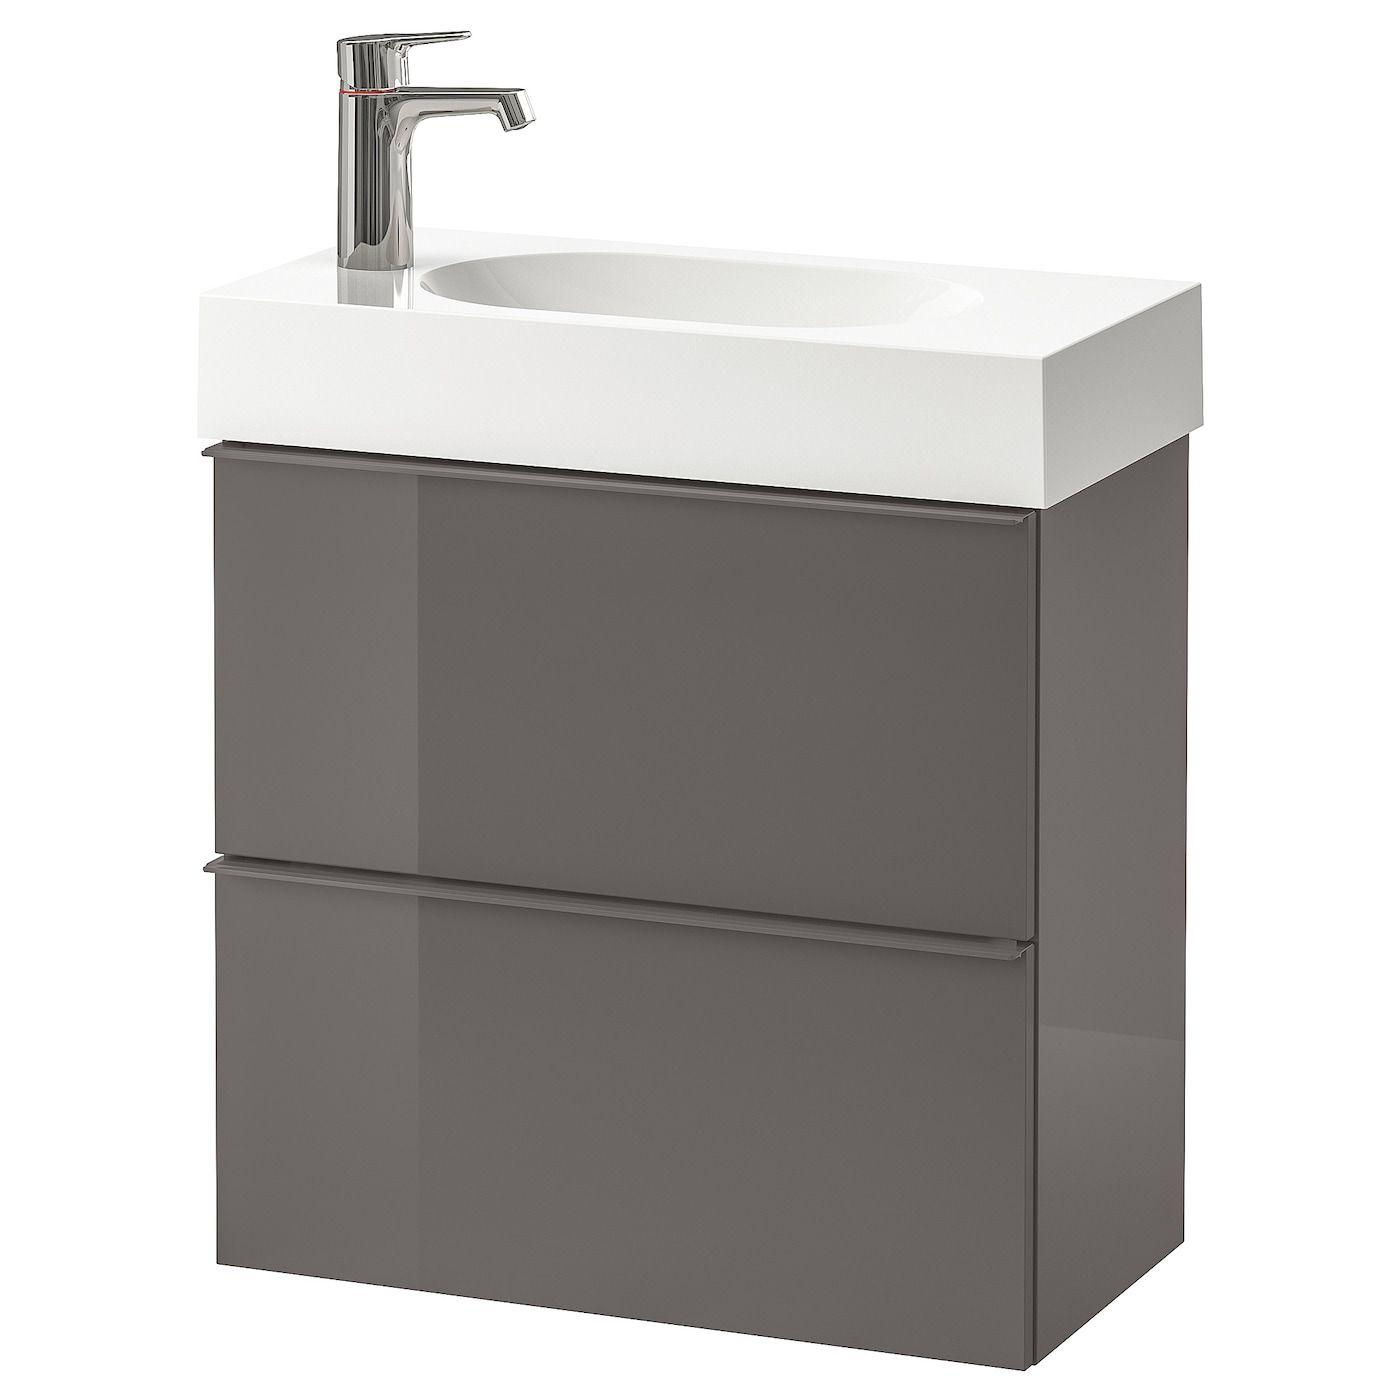 Godmorgon Braviken Meuble Lavabo 2tir Brillant Gris Mitigeur Lavabo Brogrund 62x33x68 Cm In 2020 Wash Stand Ikea Drawers